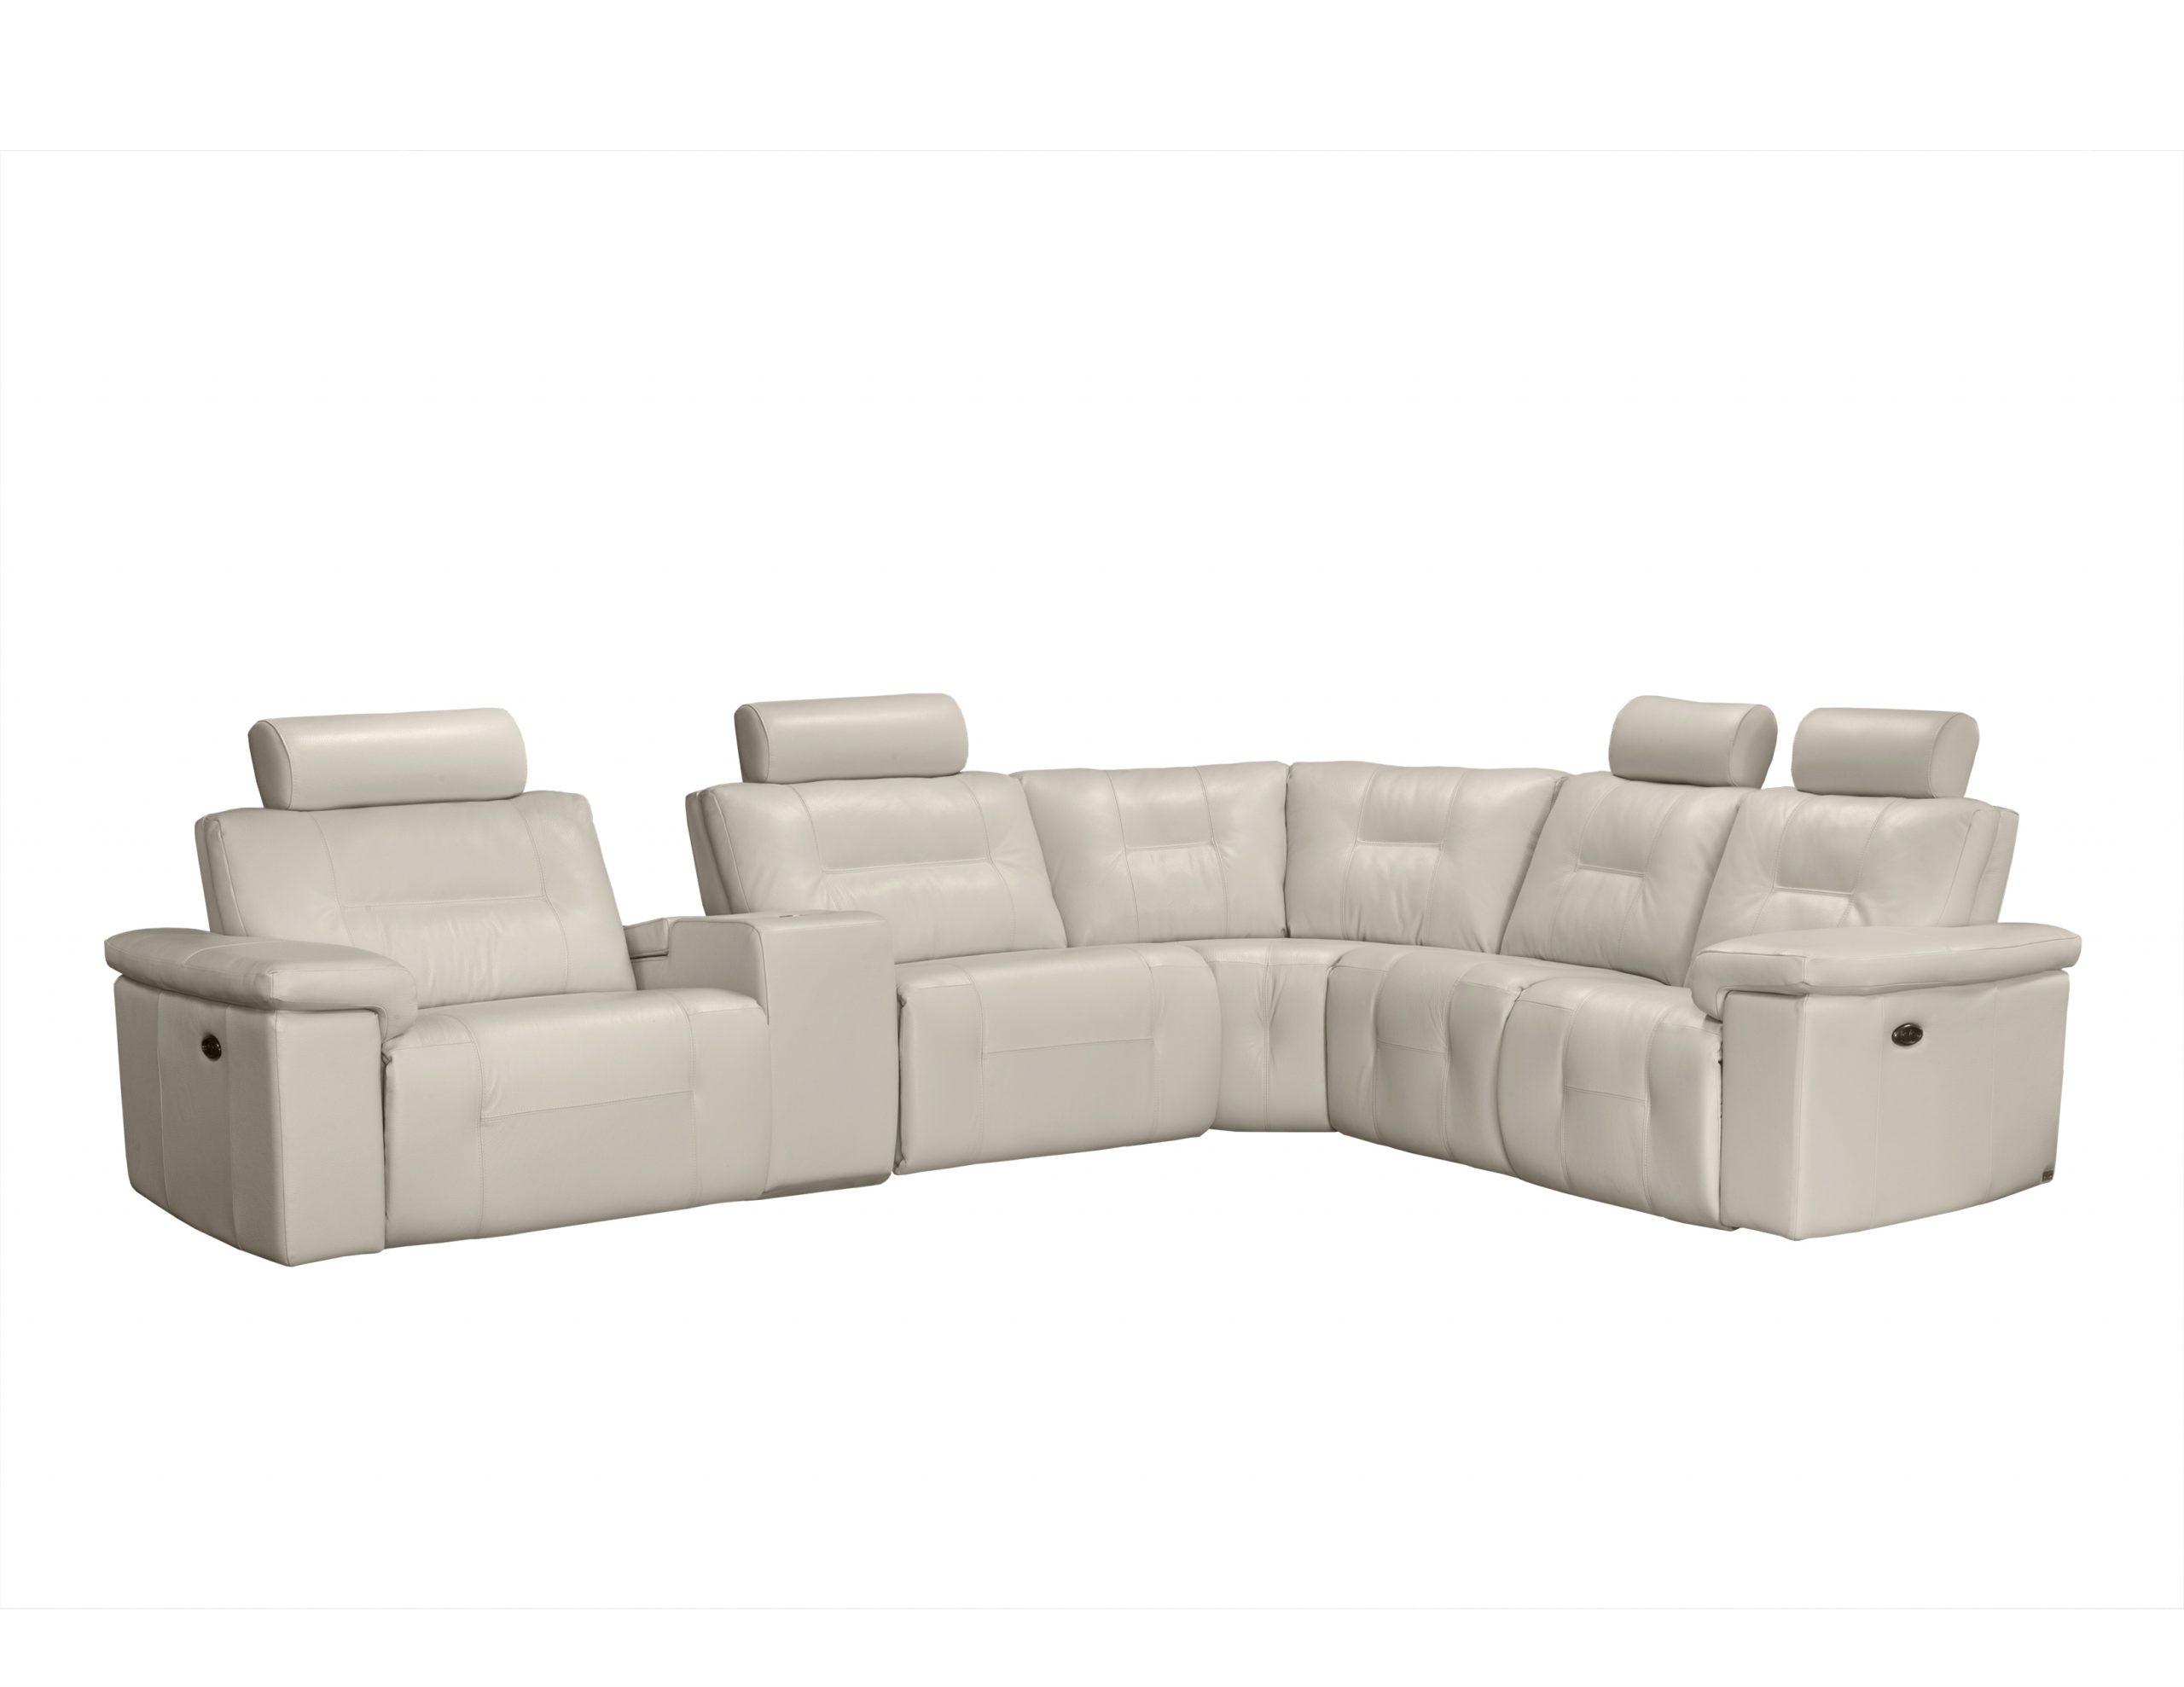 Elran Axel 4025 Seigerman S Furniture